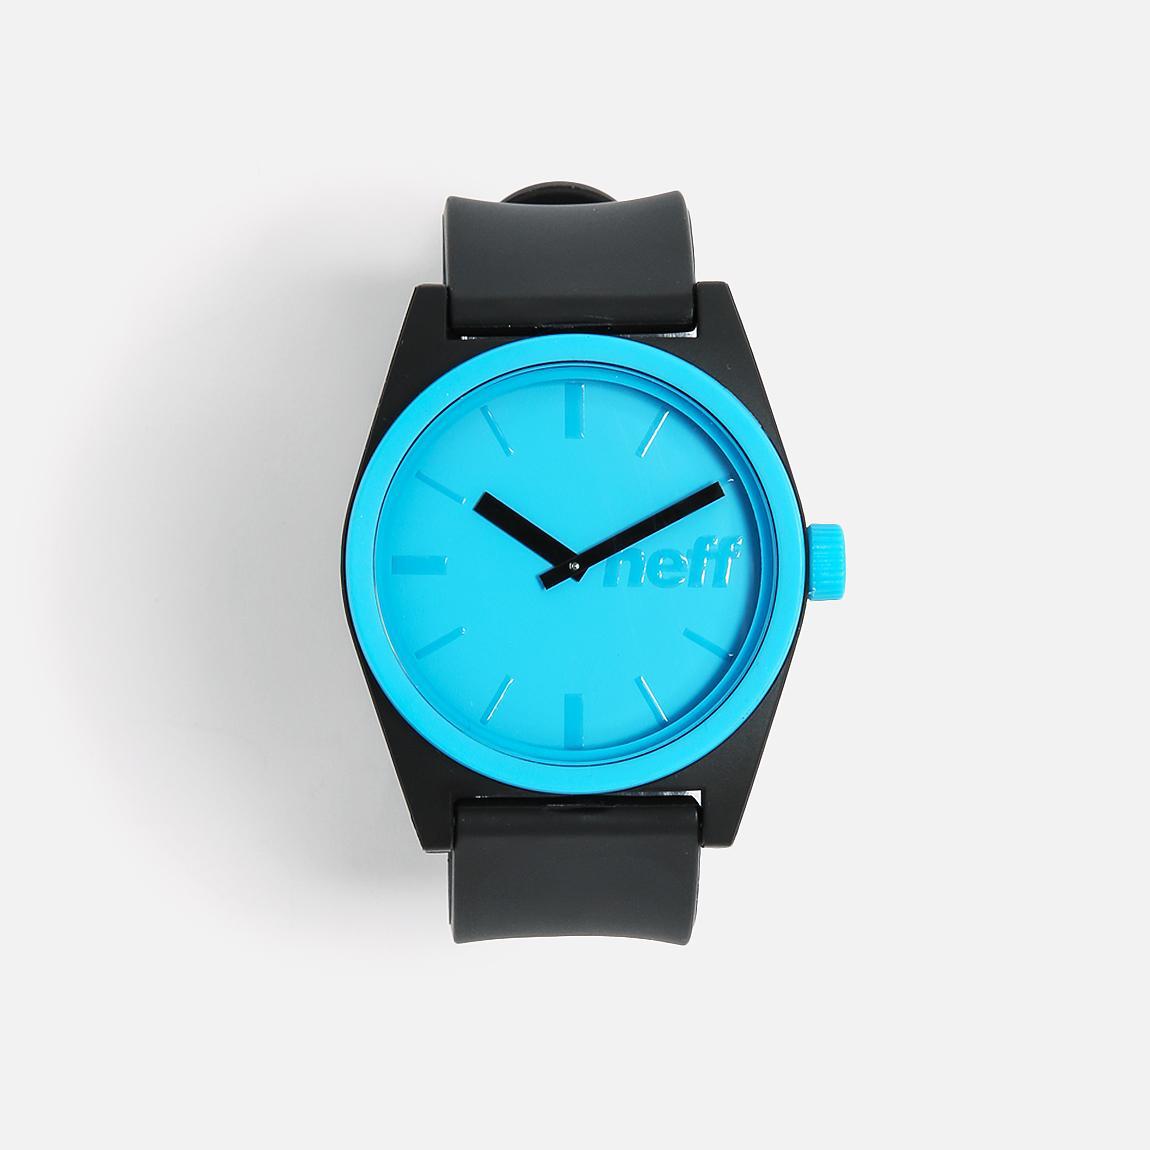 duece watch blue neff watches. Black Bedroom Furniture Sets. Home Design Ideas